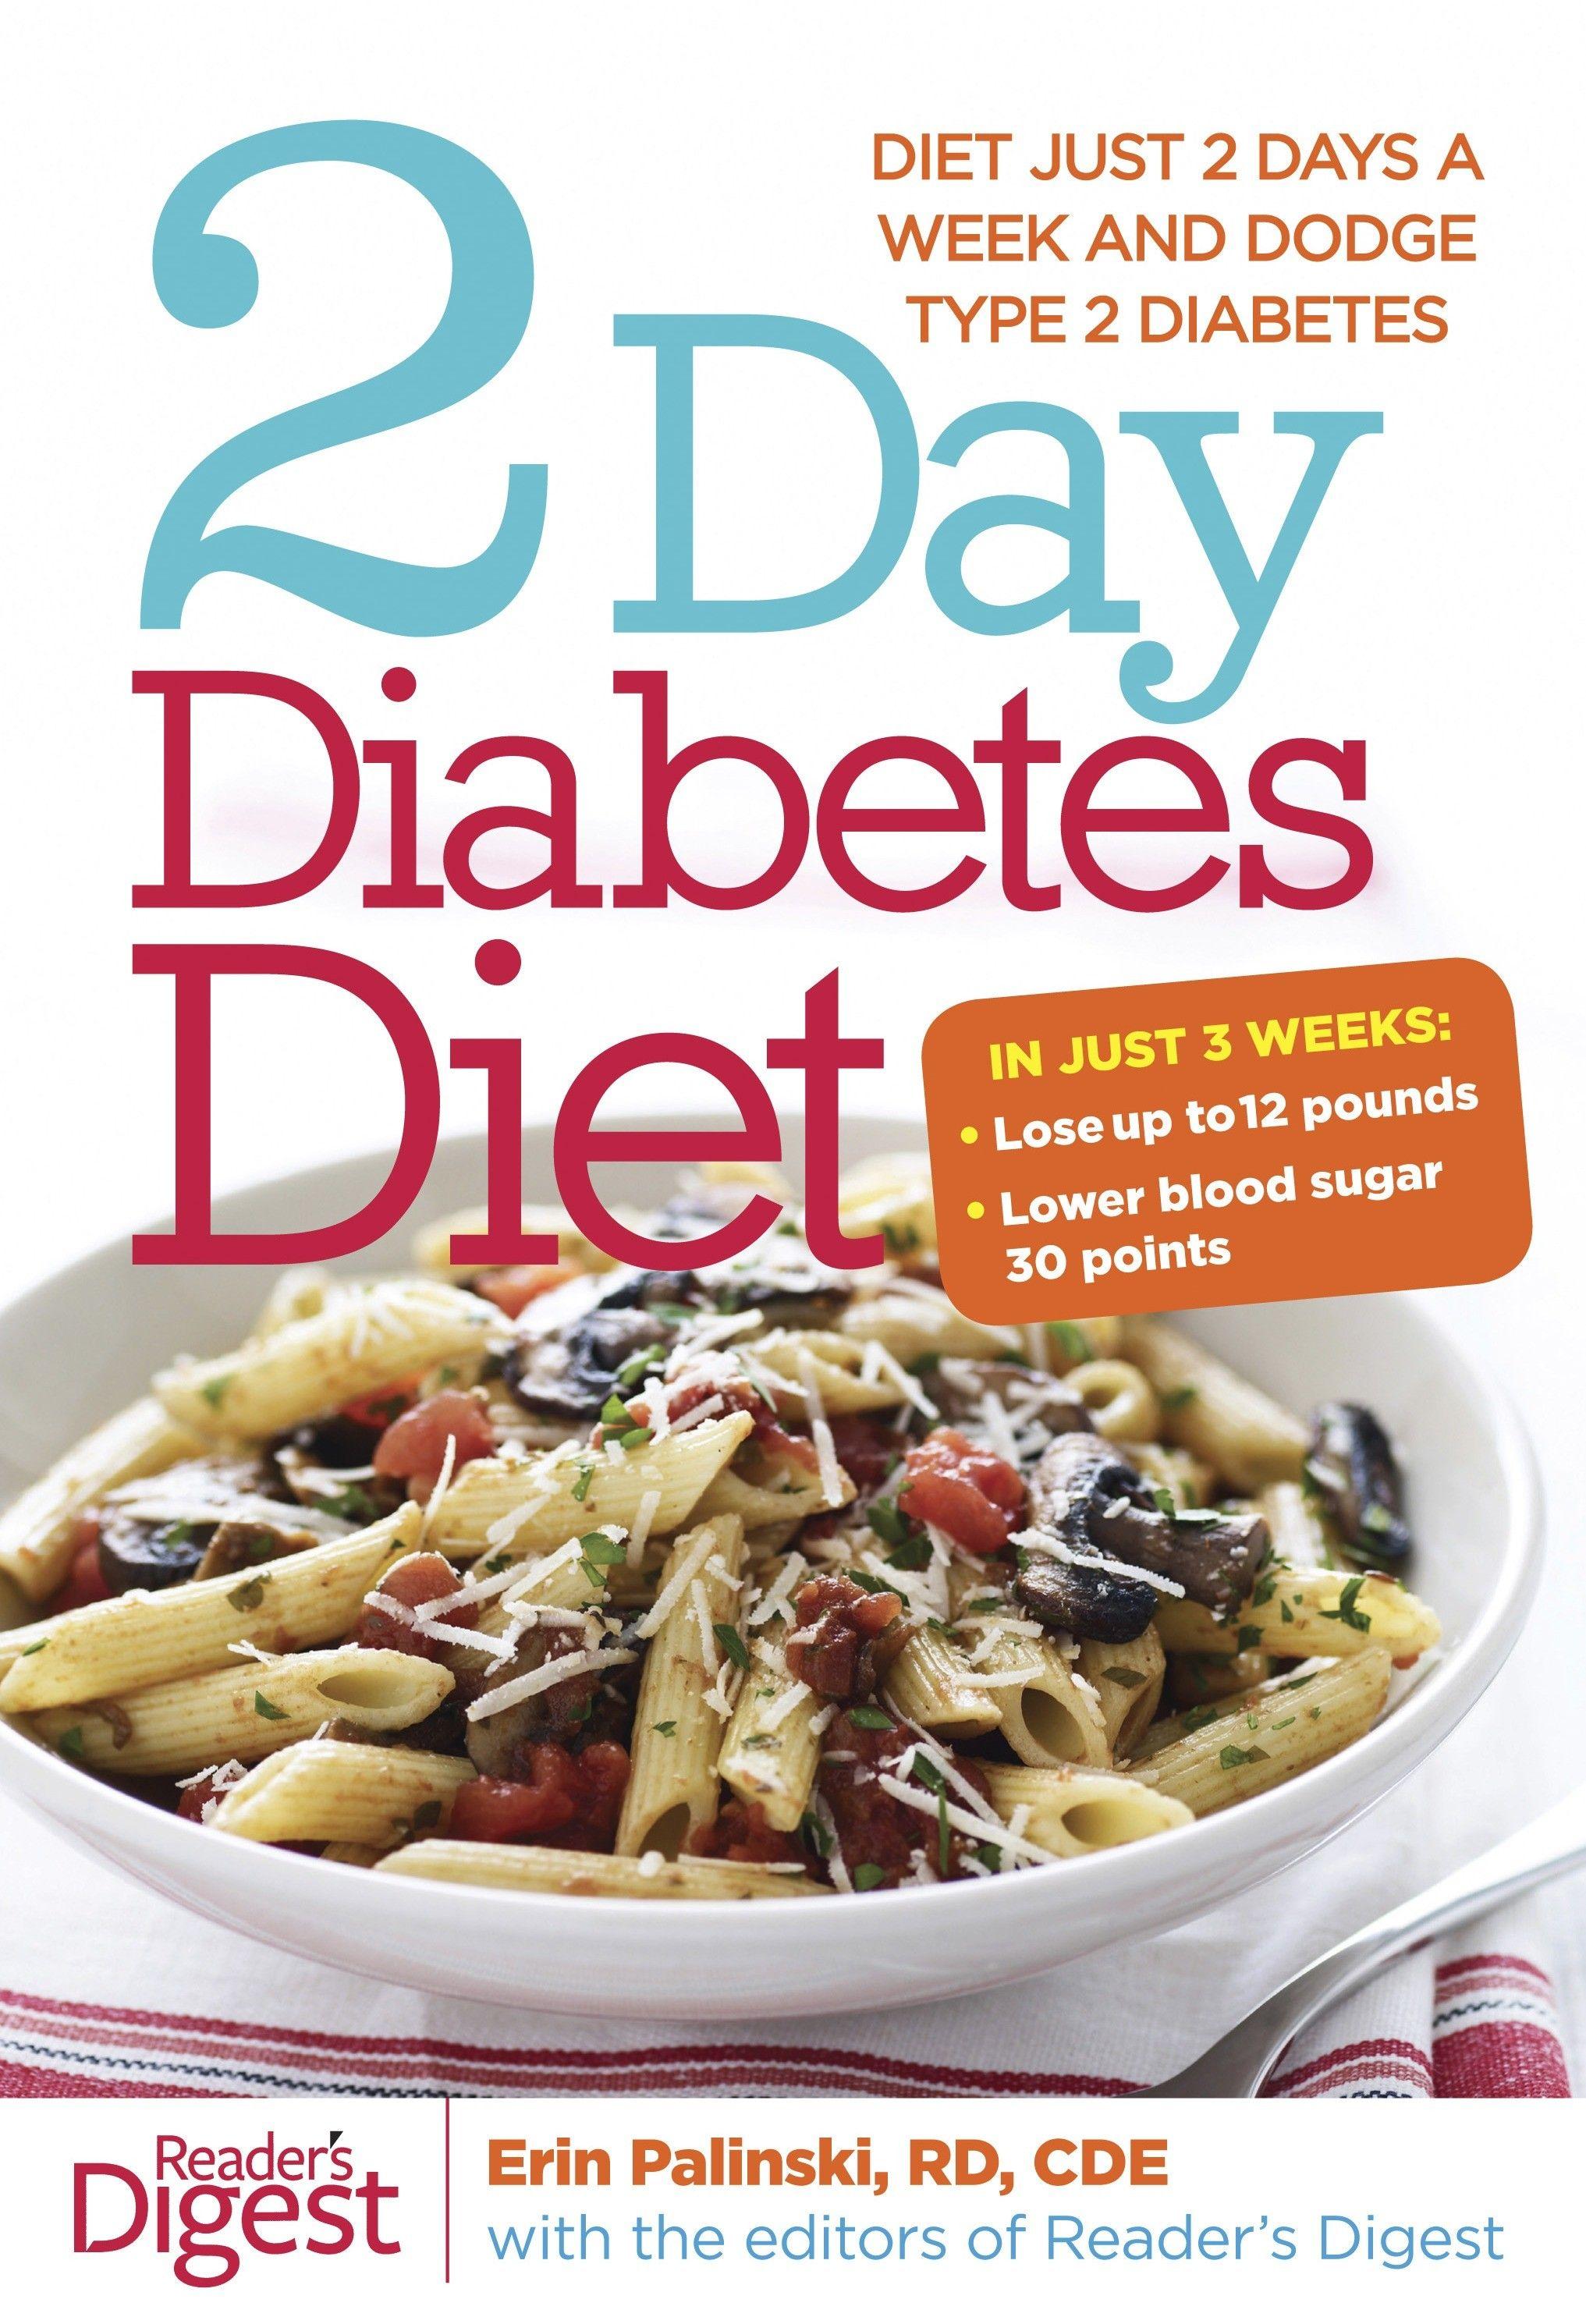 Diabetics, Pre-diabetics, And All Of